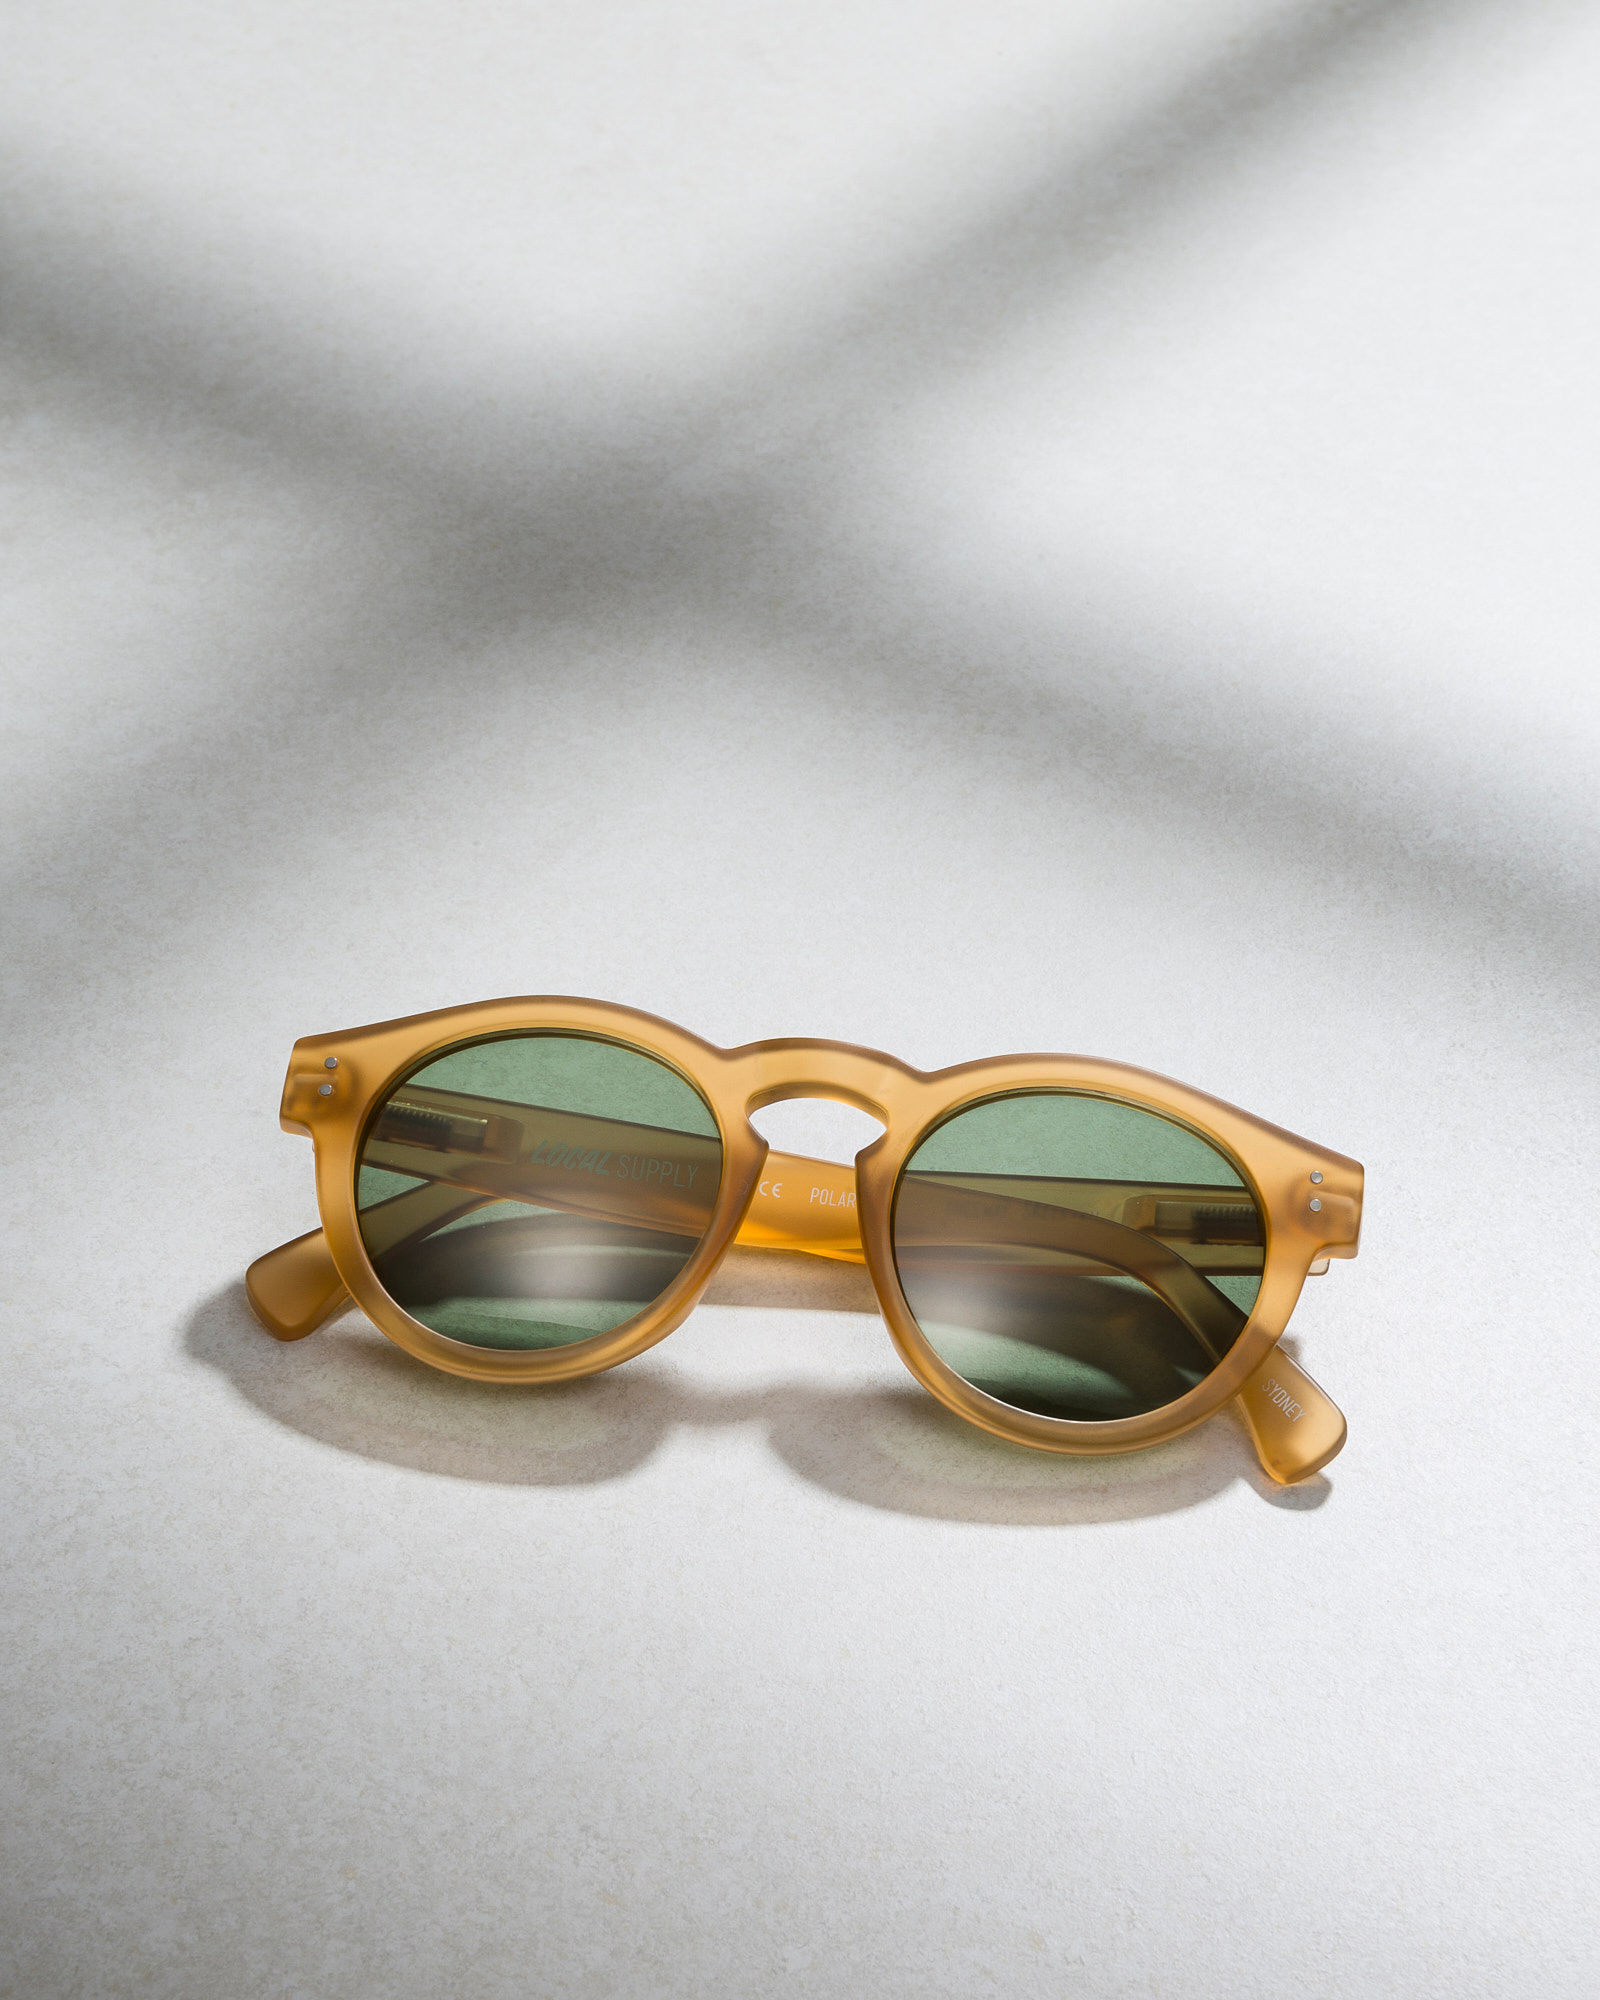 DAV1412_160615_LocalSupply_Sunglasses_01_286.jpg